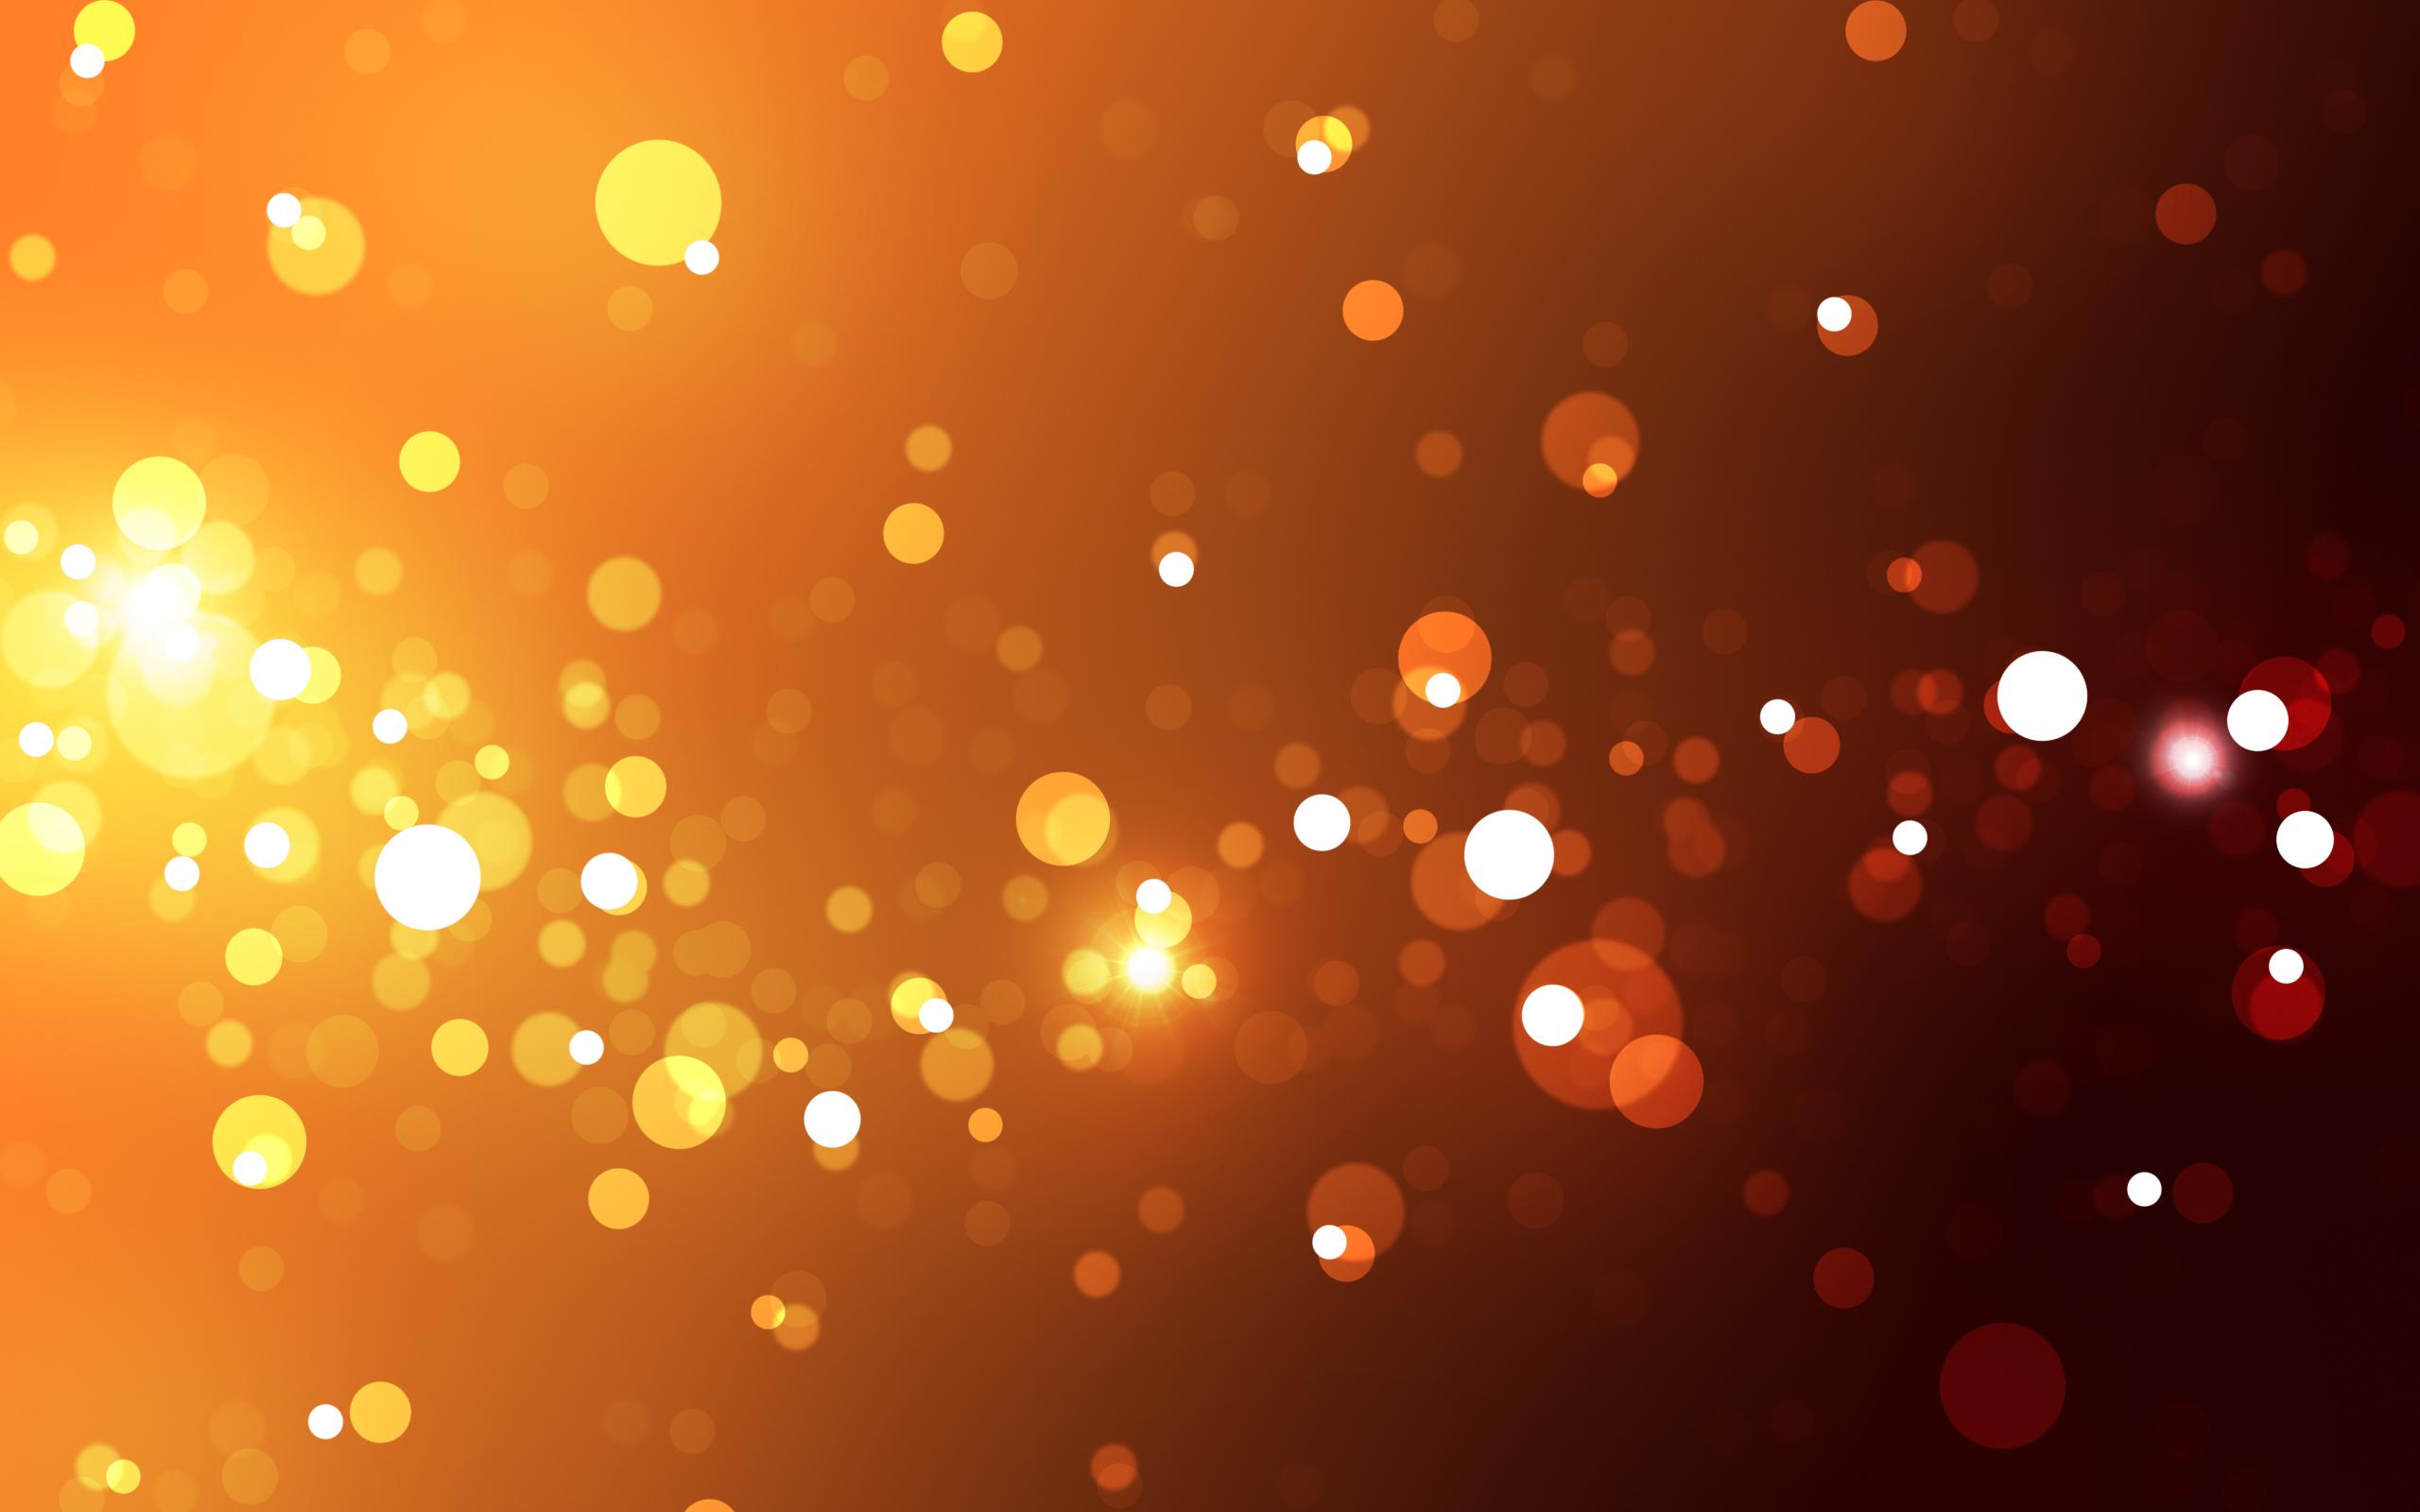 Download Abstract Lights Wallpaper 2560x1600 Wallpoper 427460 2560x1600